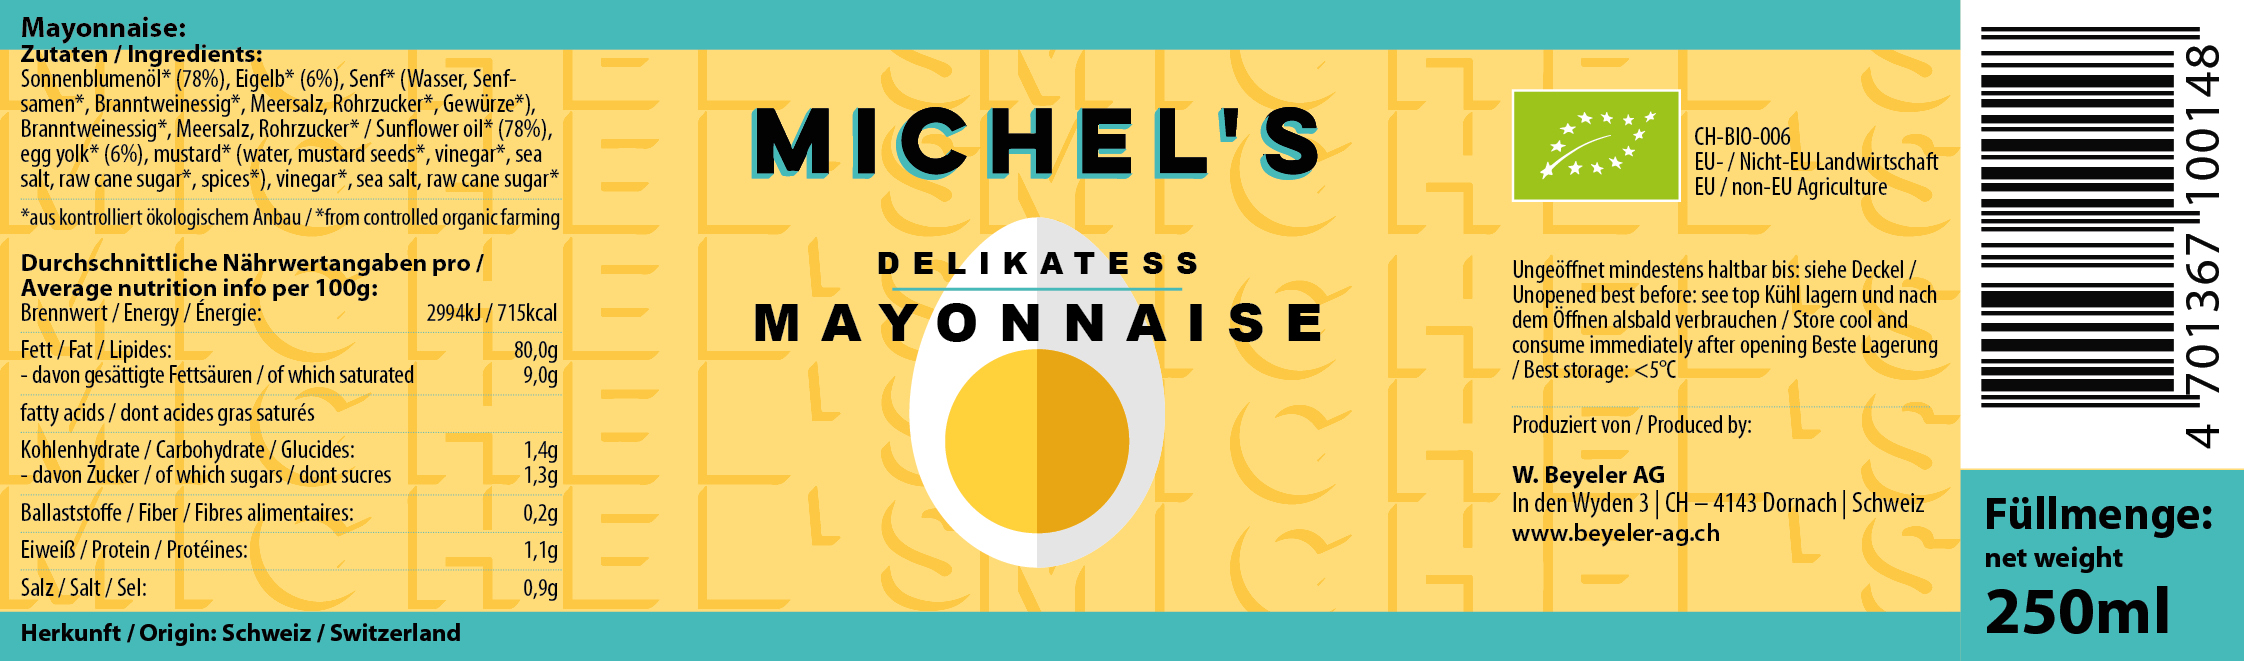 02900218_Michels_Logo_Design_Packaging_Mayonnaise3.jpg